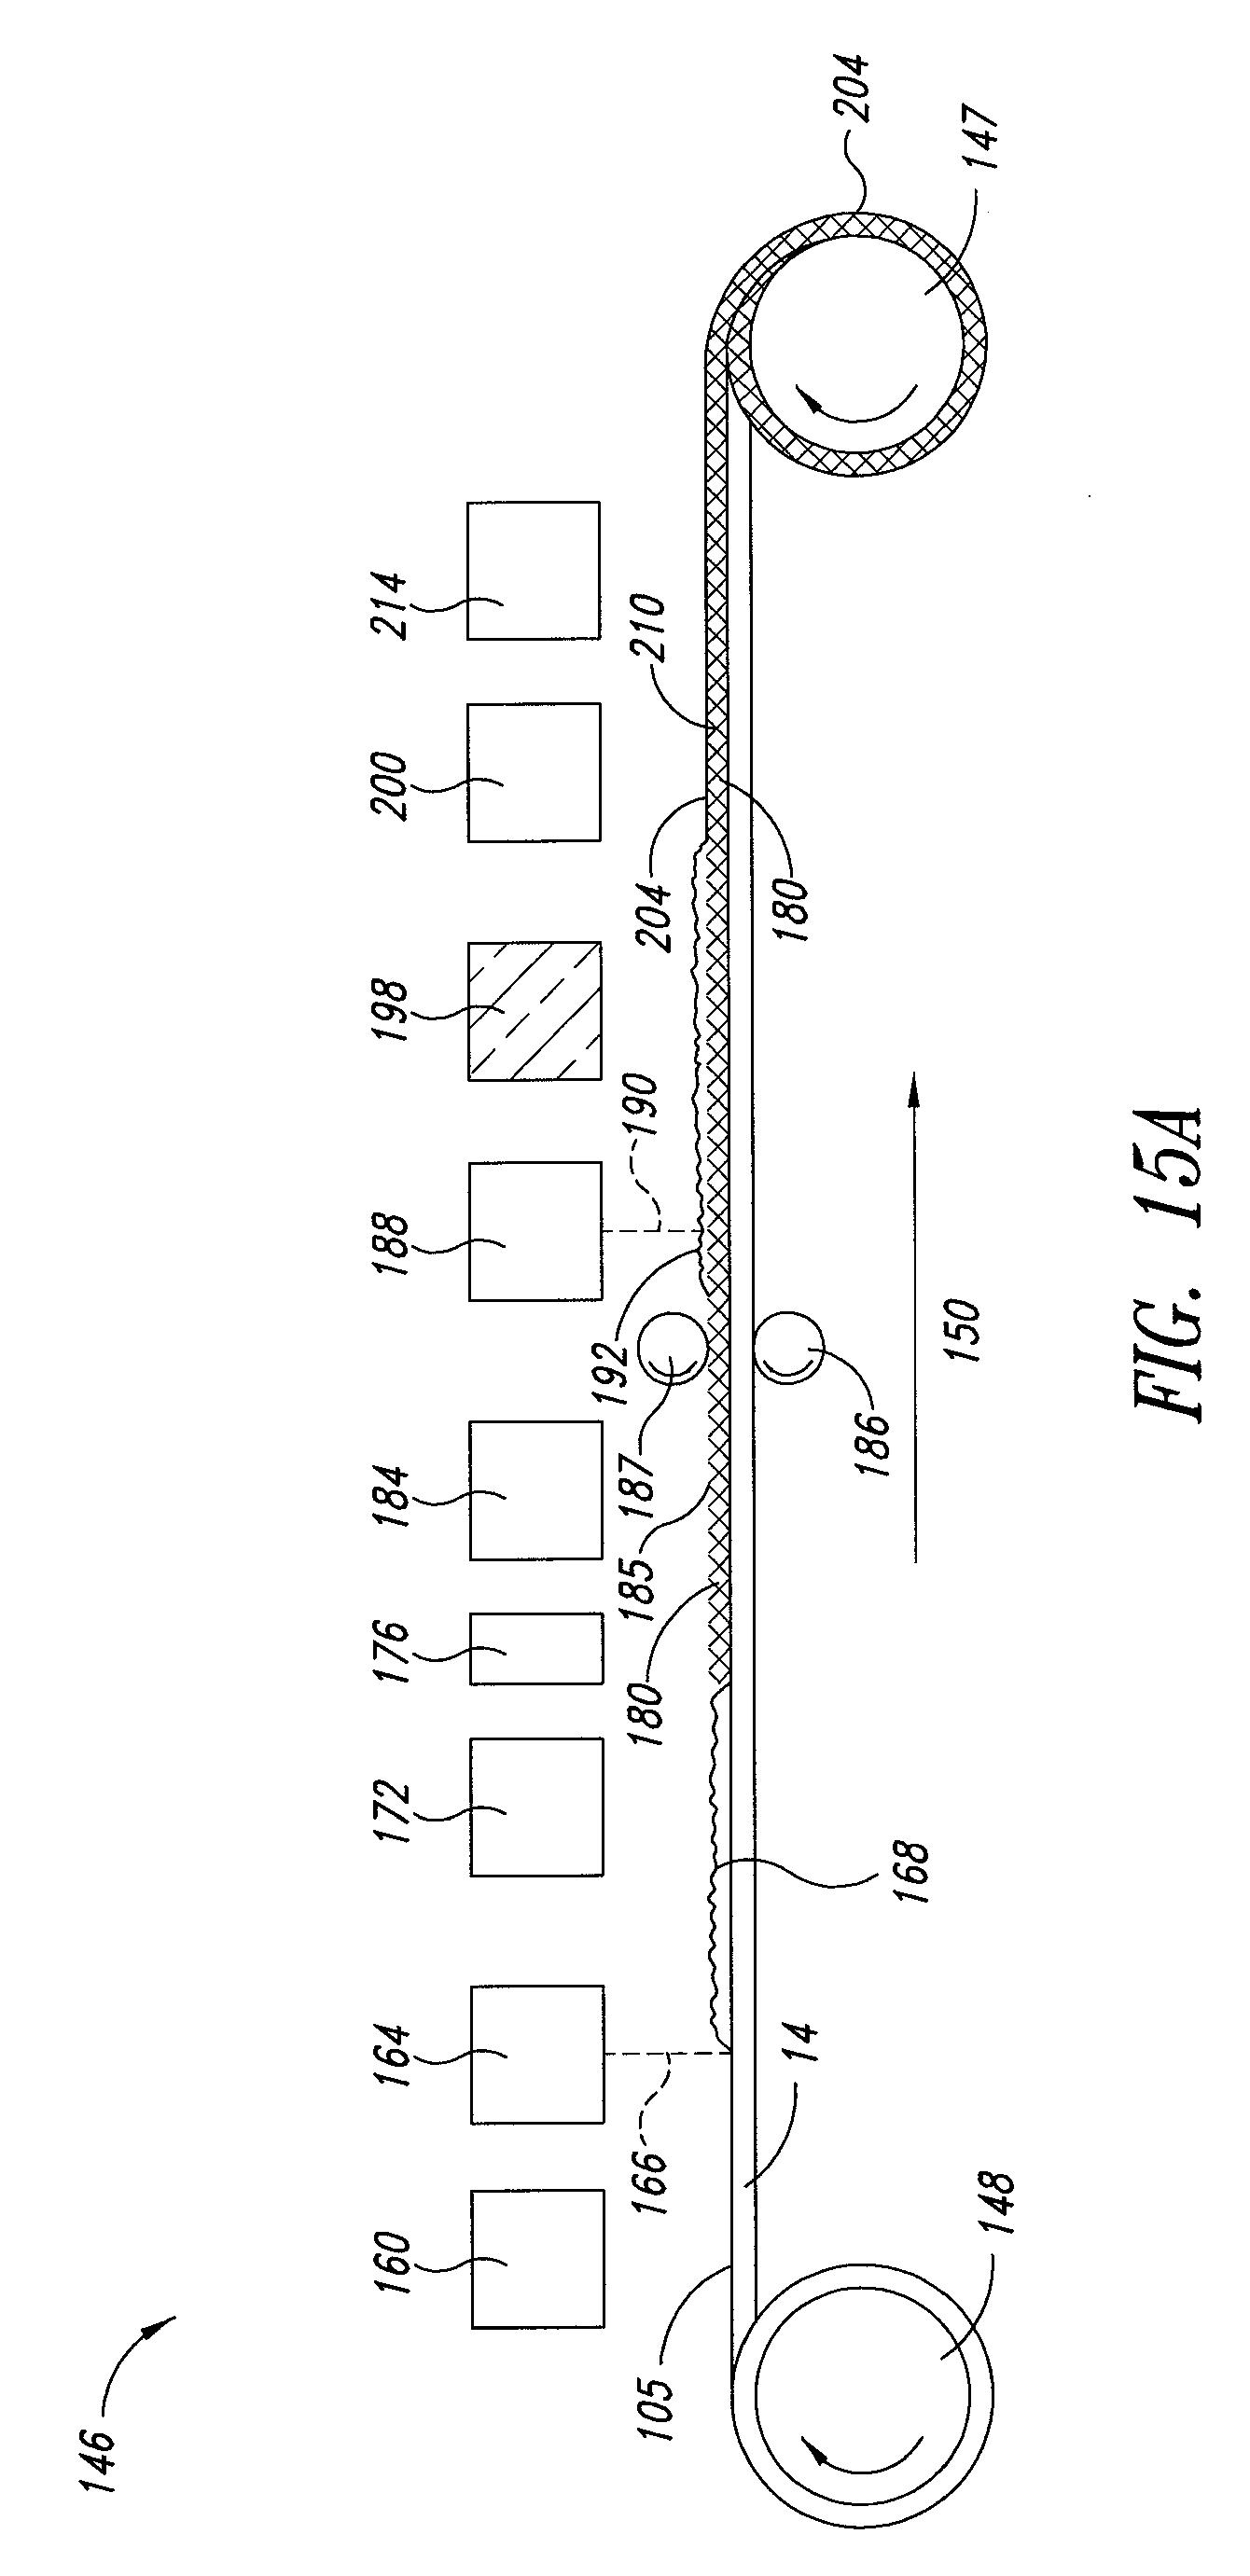 US8174667B2 - Nanowire-based transparent conductors and ... on data sheet pdf, body diagram pdf, power pdf, plumbing diagram pdf, battery diagram pdf, welding diagram pdf,